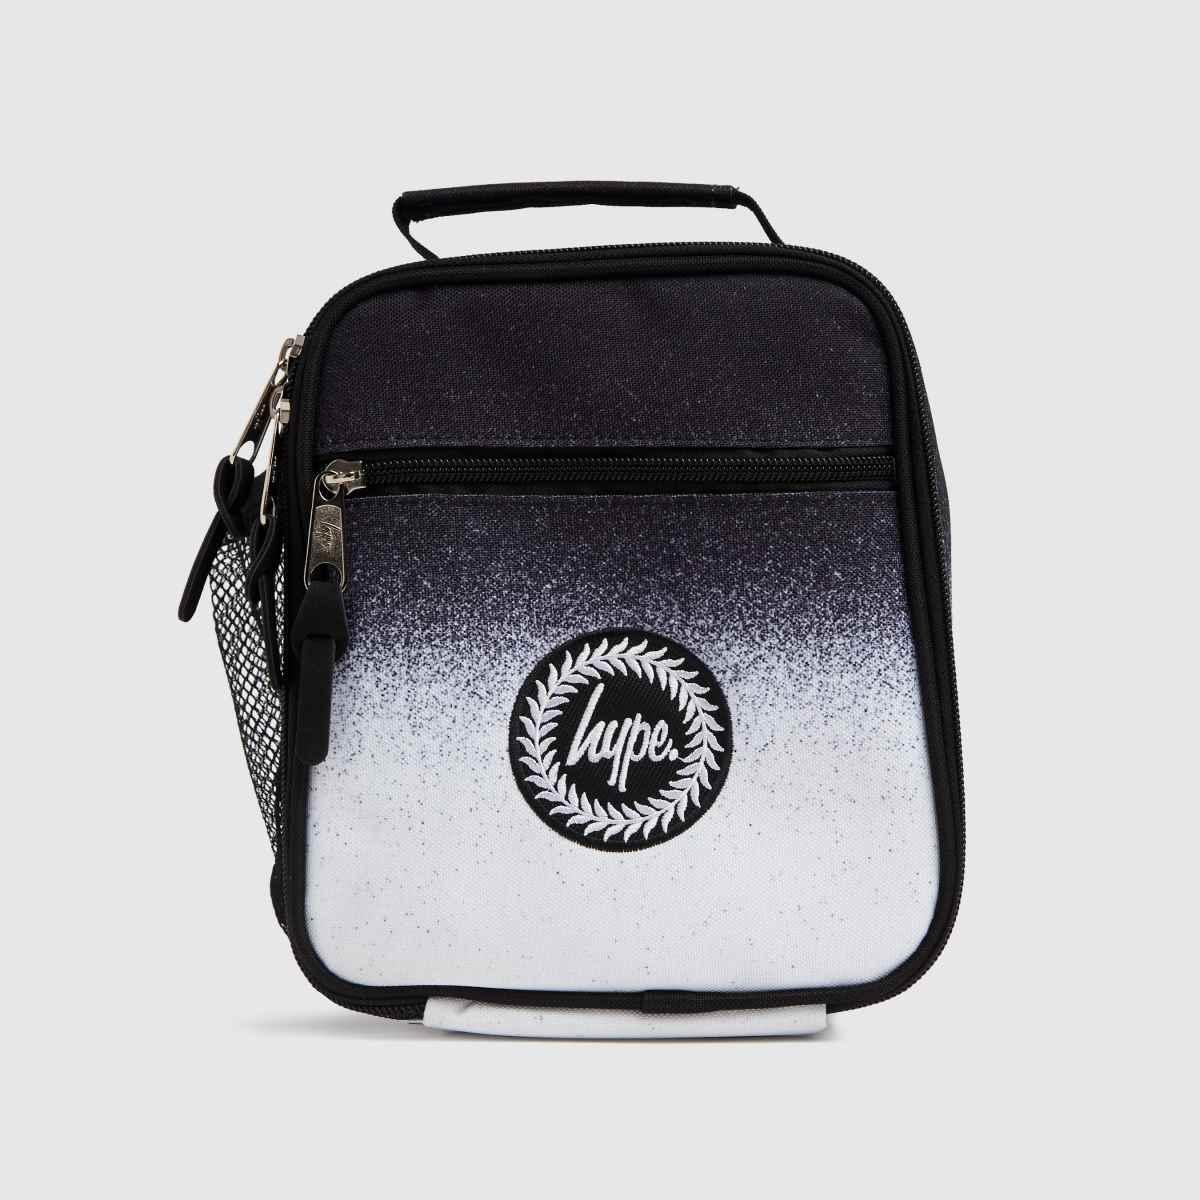 Hype Black & White Mono Speckle Lunch Bag